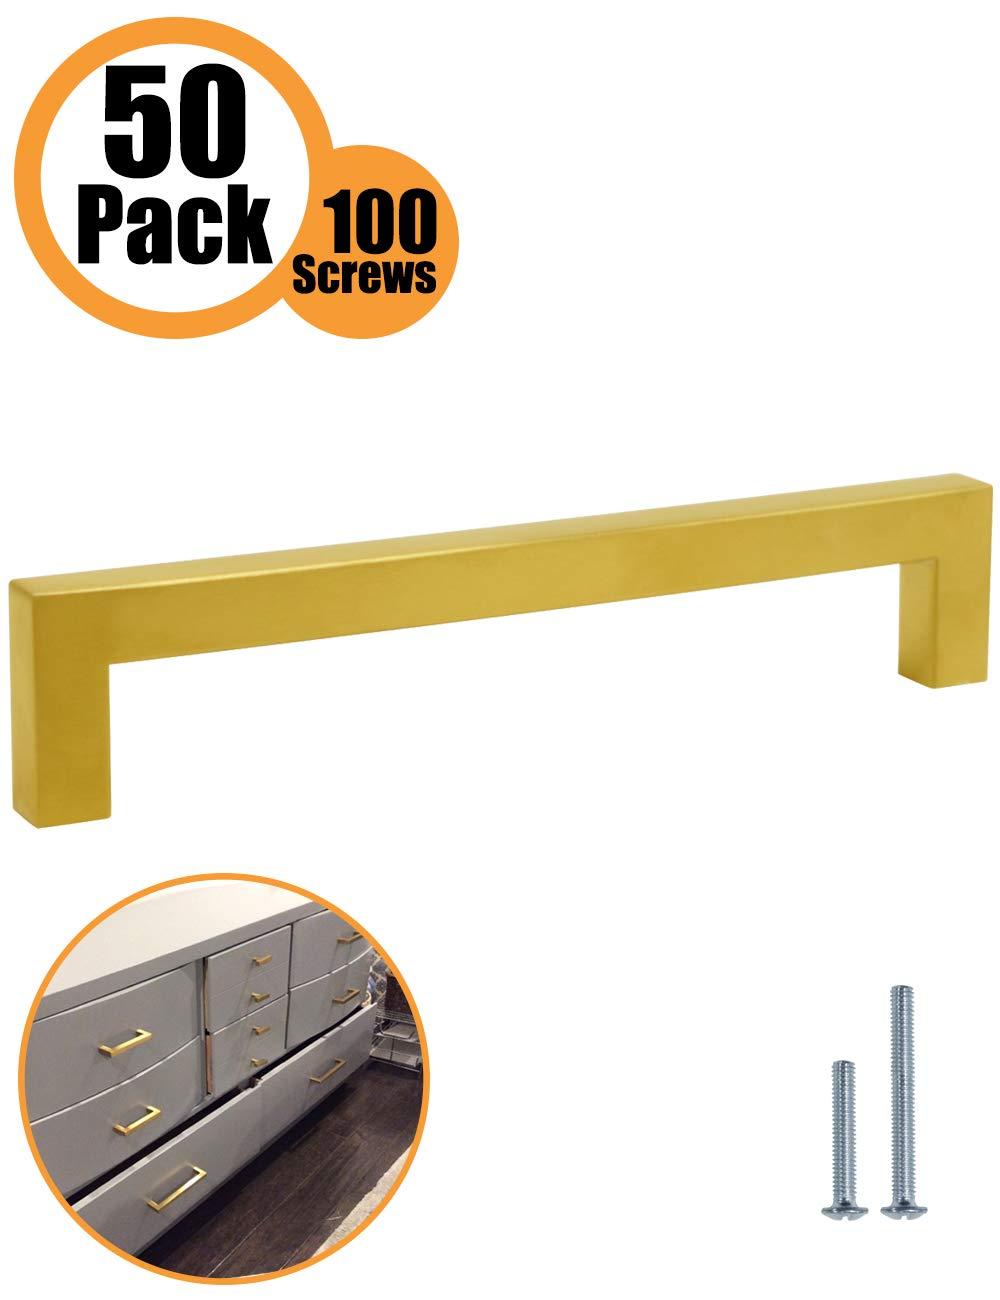 Tiradores para puerta de armario de cocina 12 mm de ancho color dorado PinLin Hole Centre 160mm acero inoxidable acero inoxidable 5 Pack